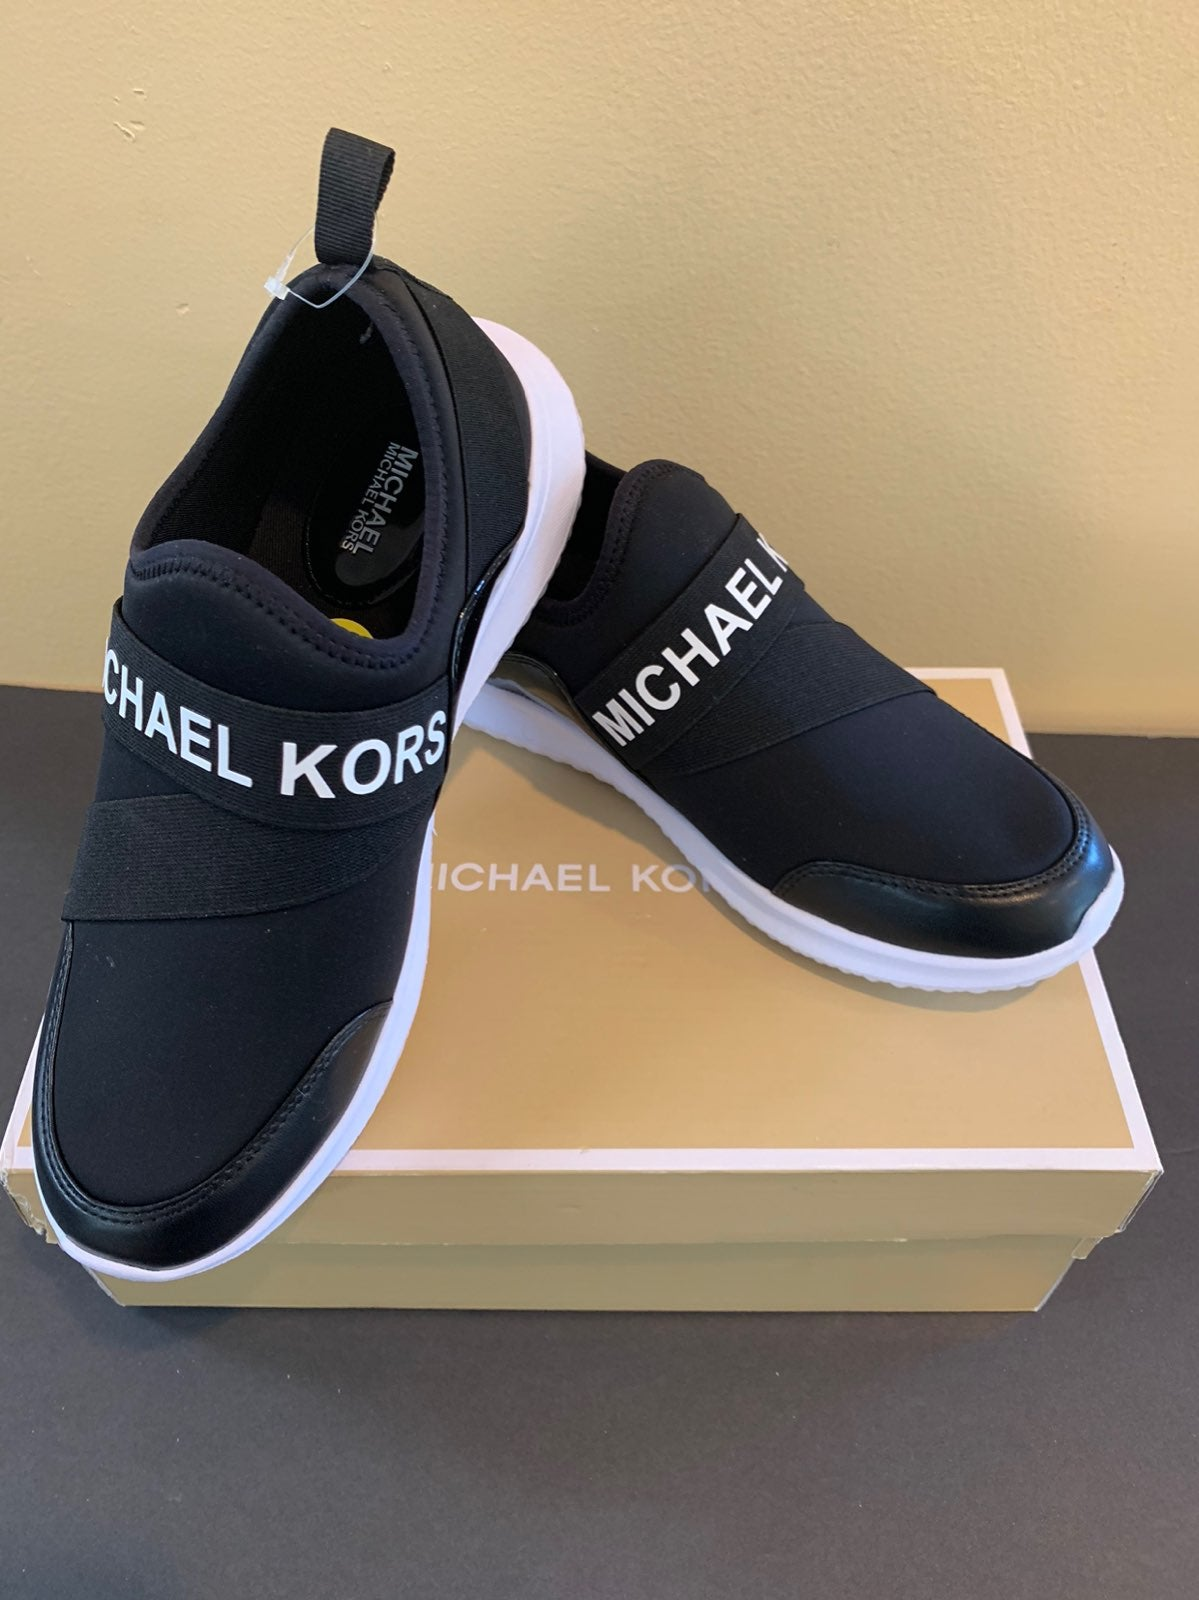 Michael Kors Shoes Brand New